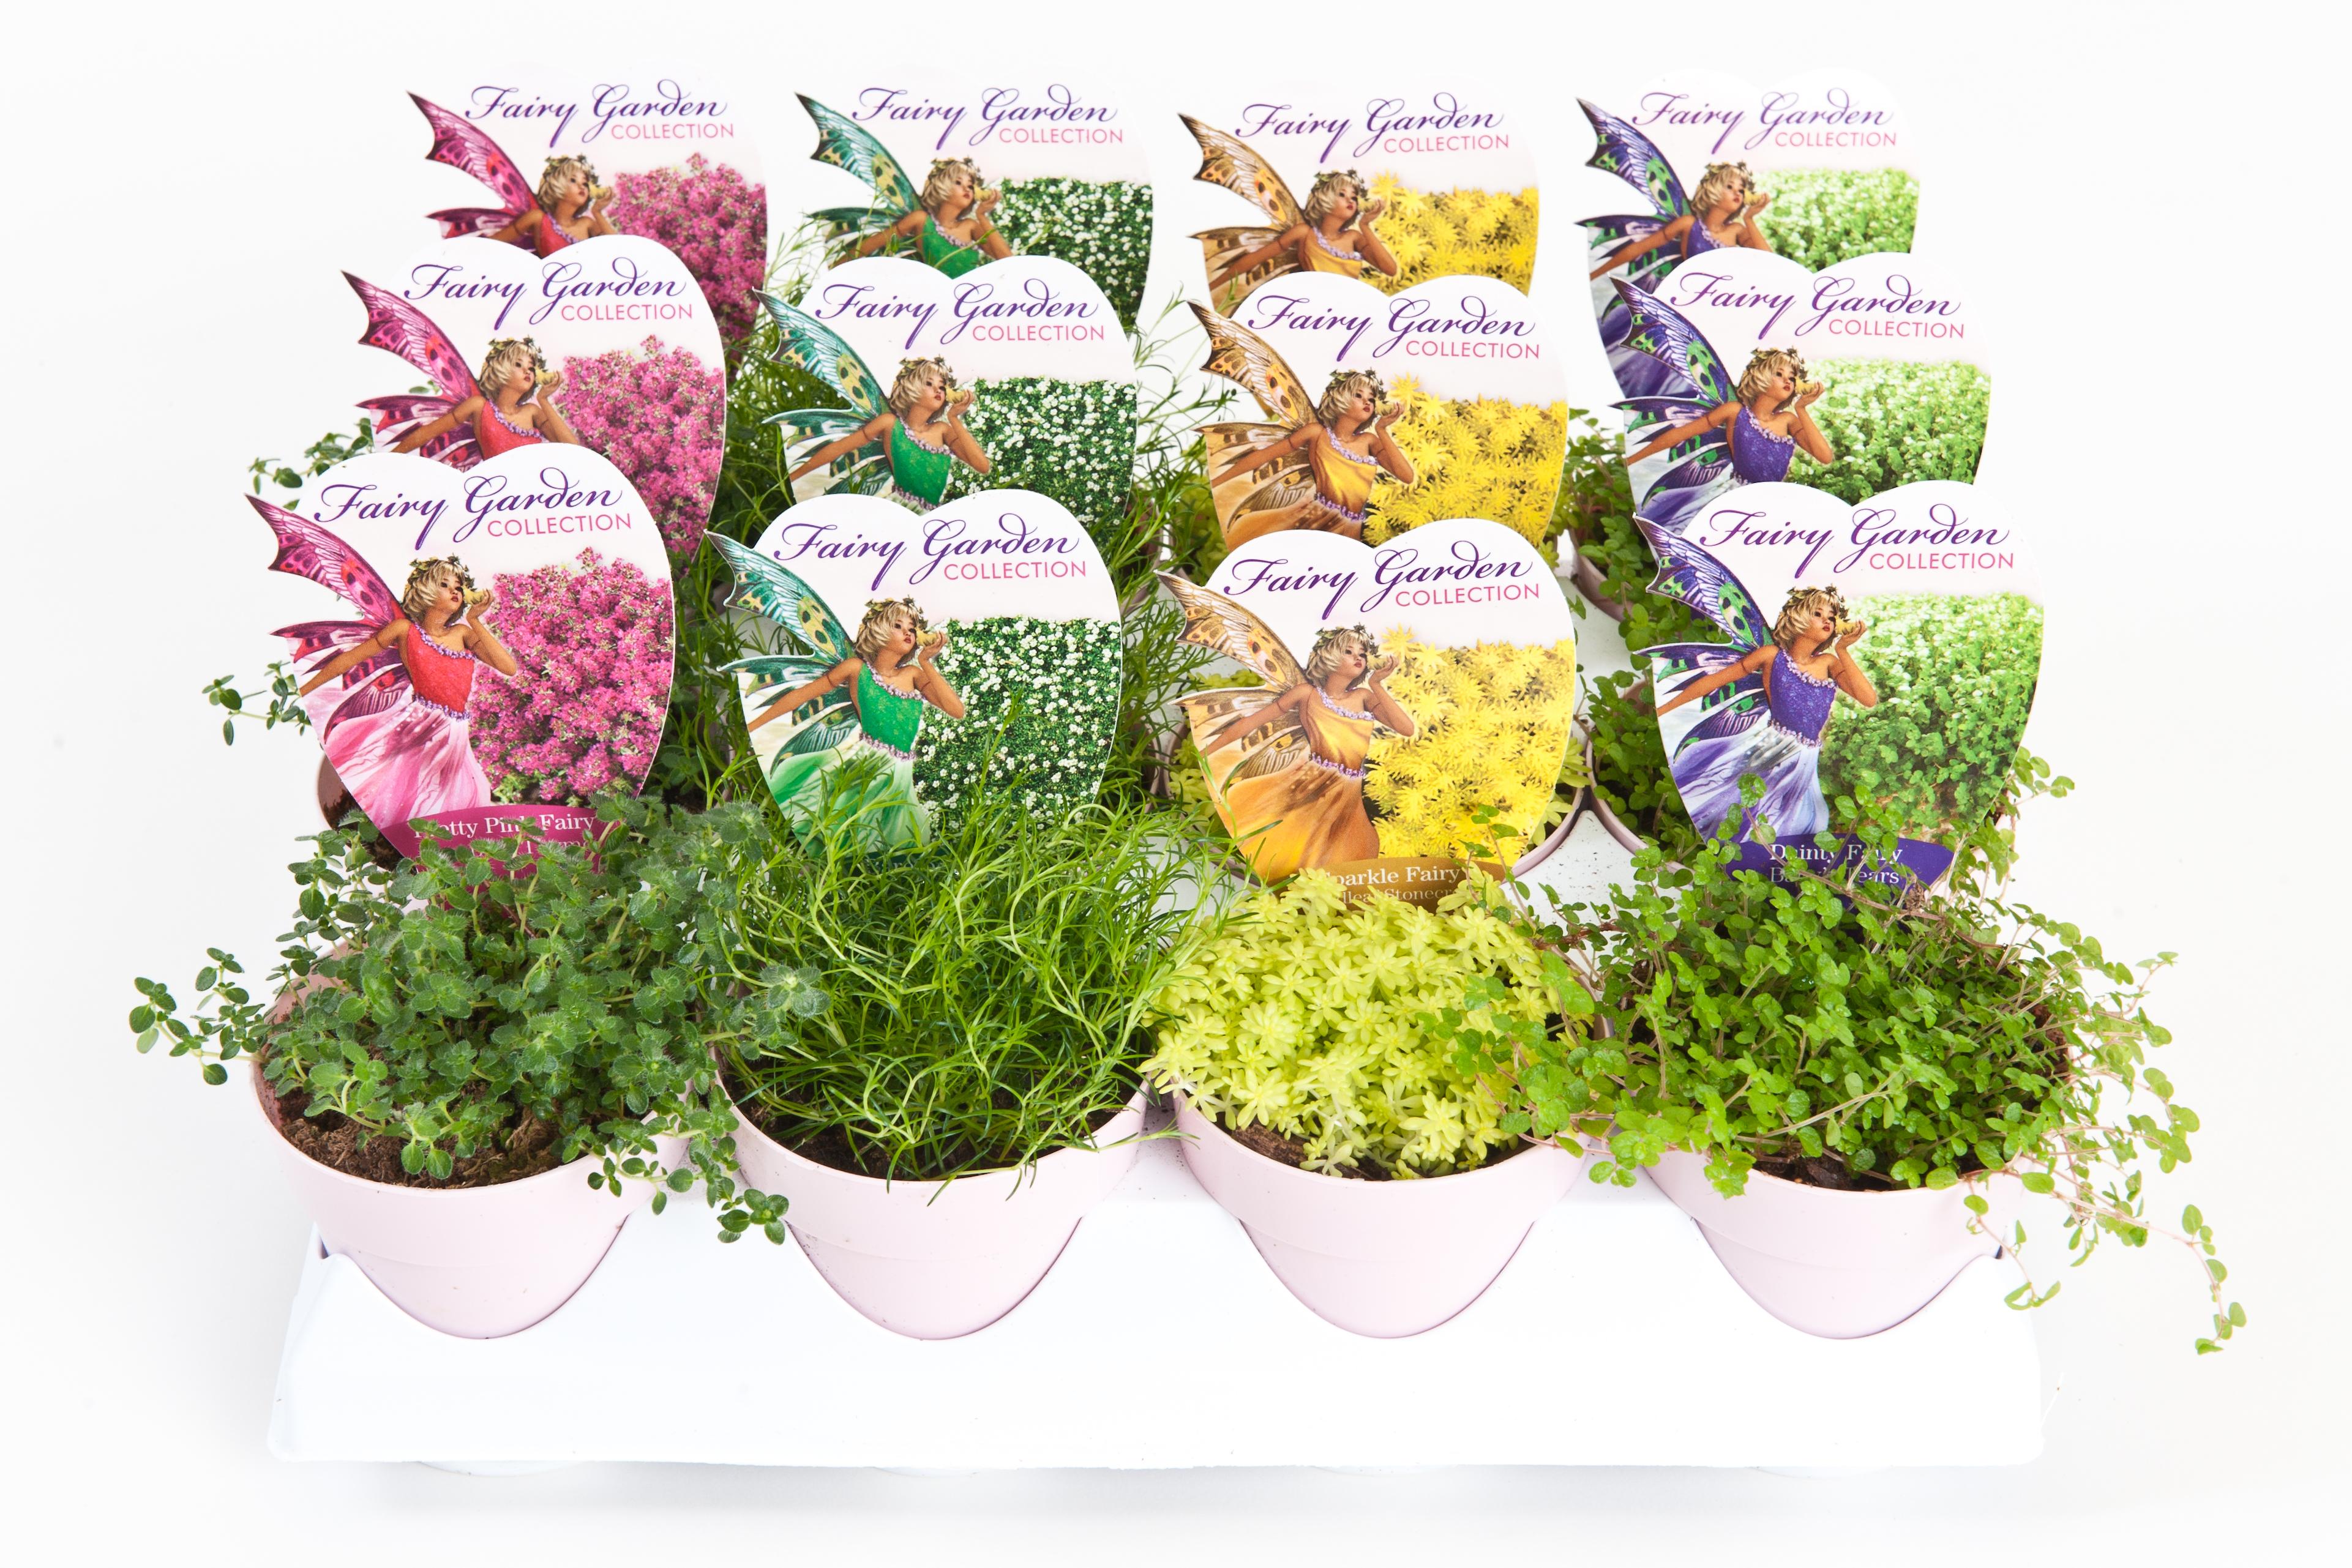 download high resolution image - Fairy Garden Plants